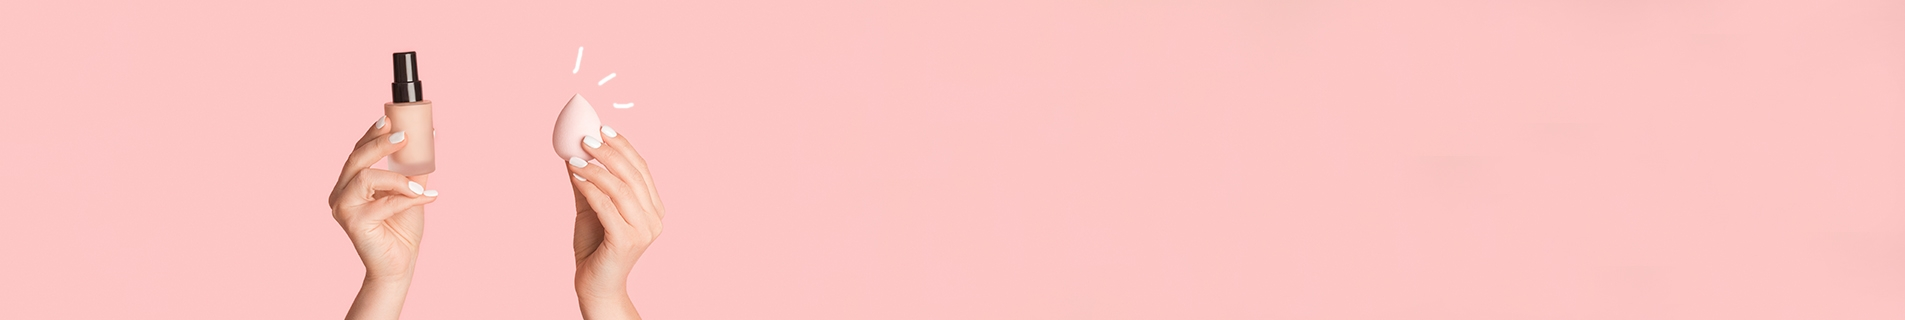 Accessoire ongle | Site de maquillage | SAGA Cosmetics